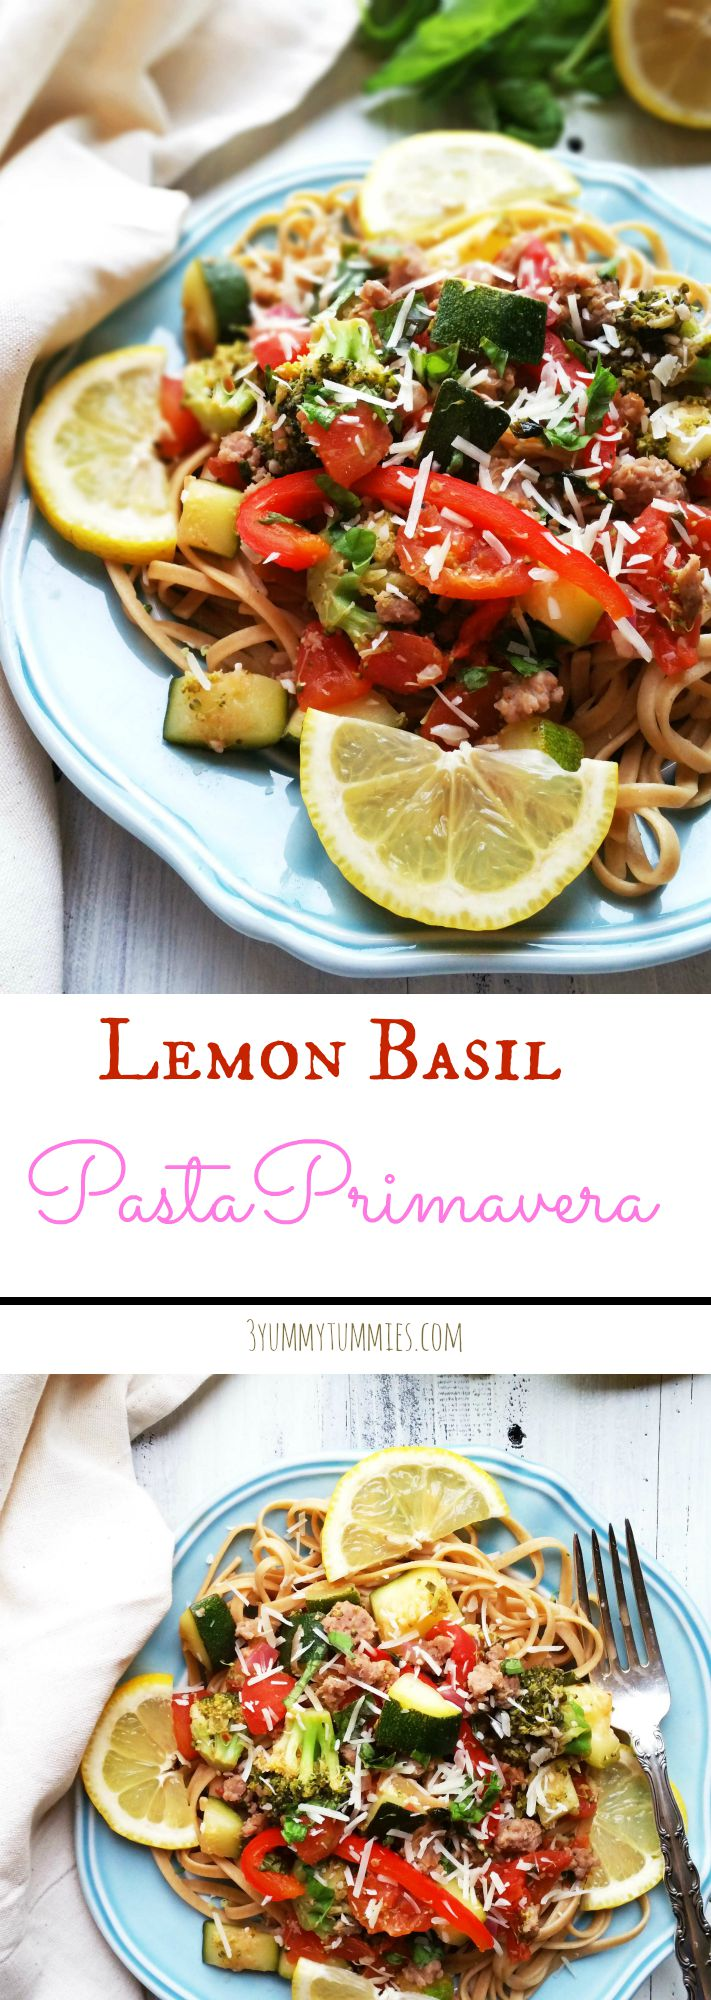 Lemon Basil Pasta Primavera | 3 Yummy Tummies